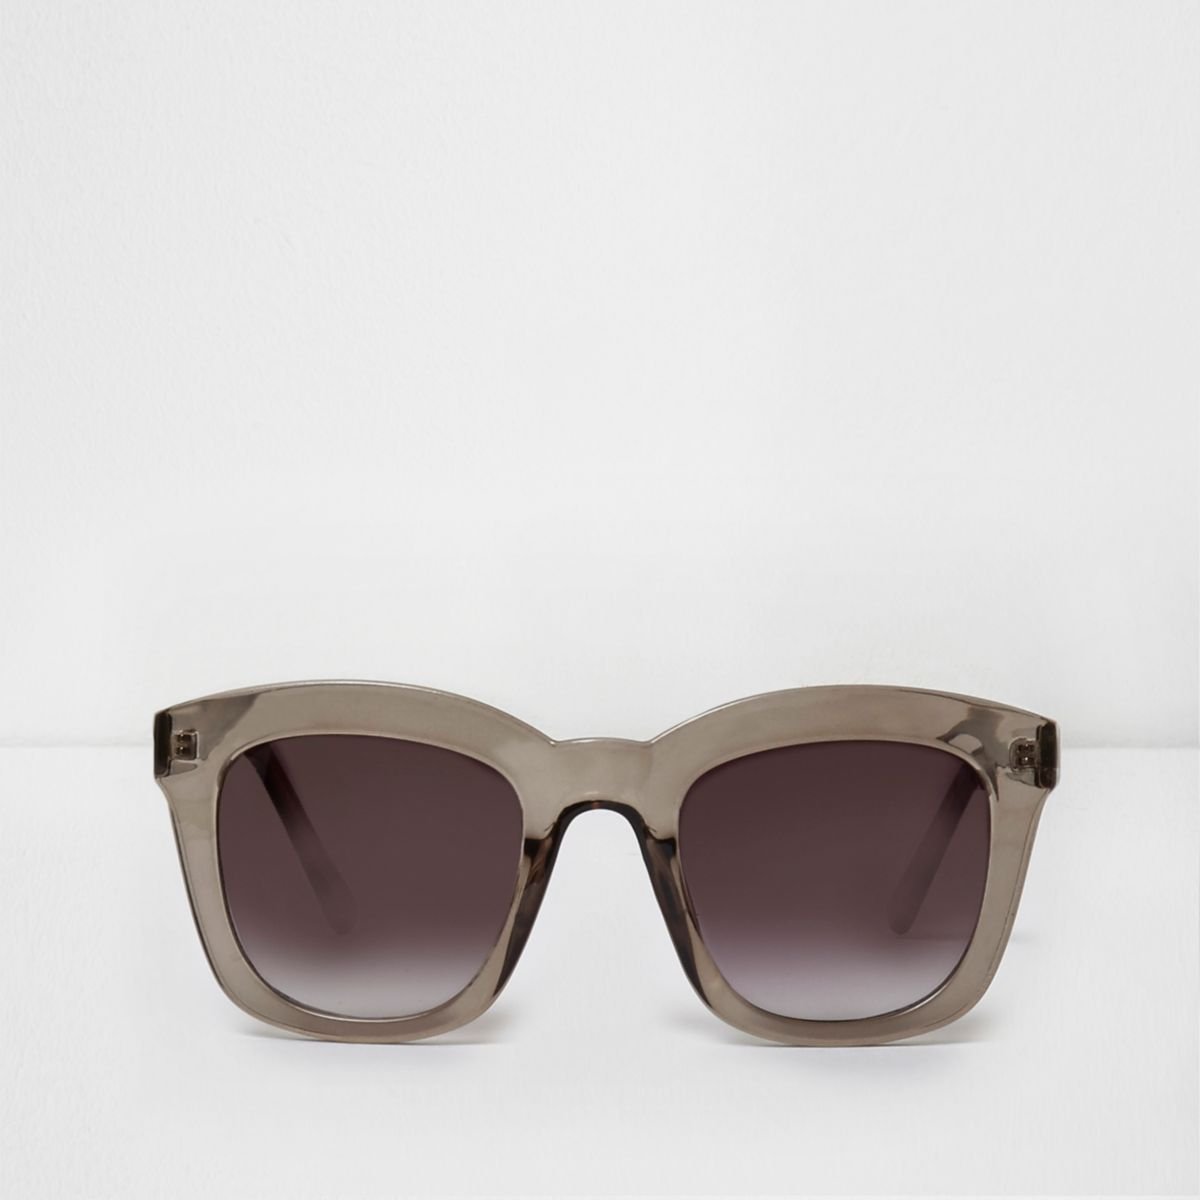 Dark grey oversized glam smoke sunglasses